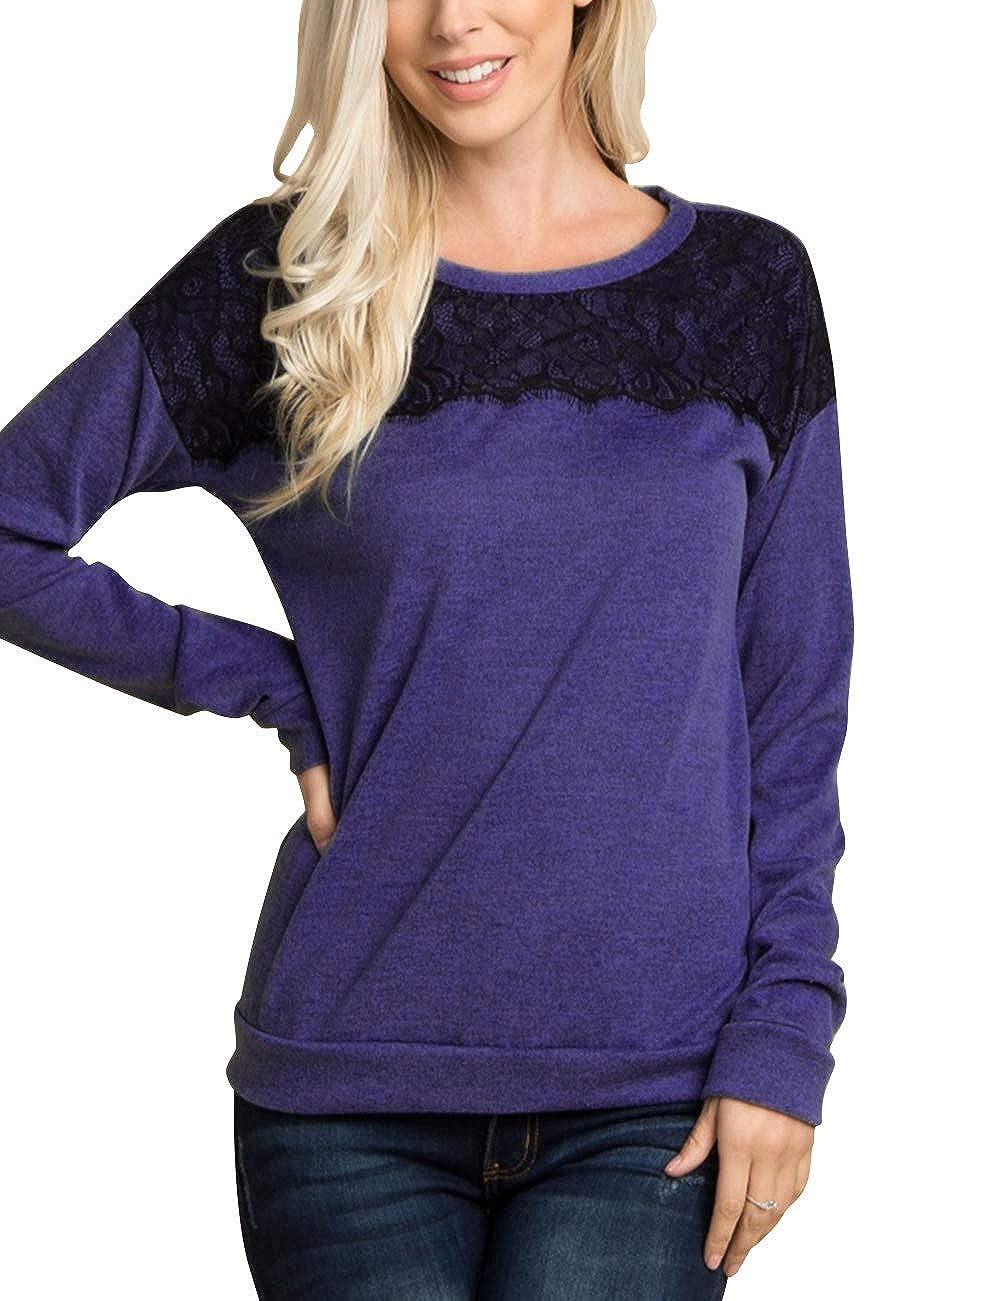 7fac67d59c JOYMODE Women s Long Sleeve Tunic Sweater Tops Round Neck Lace Front Tunic  Shirts Pullover Sweatshirt at Amazon Women s Clothing store